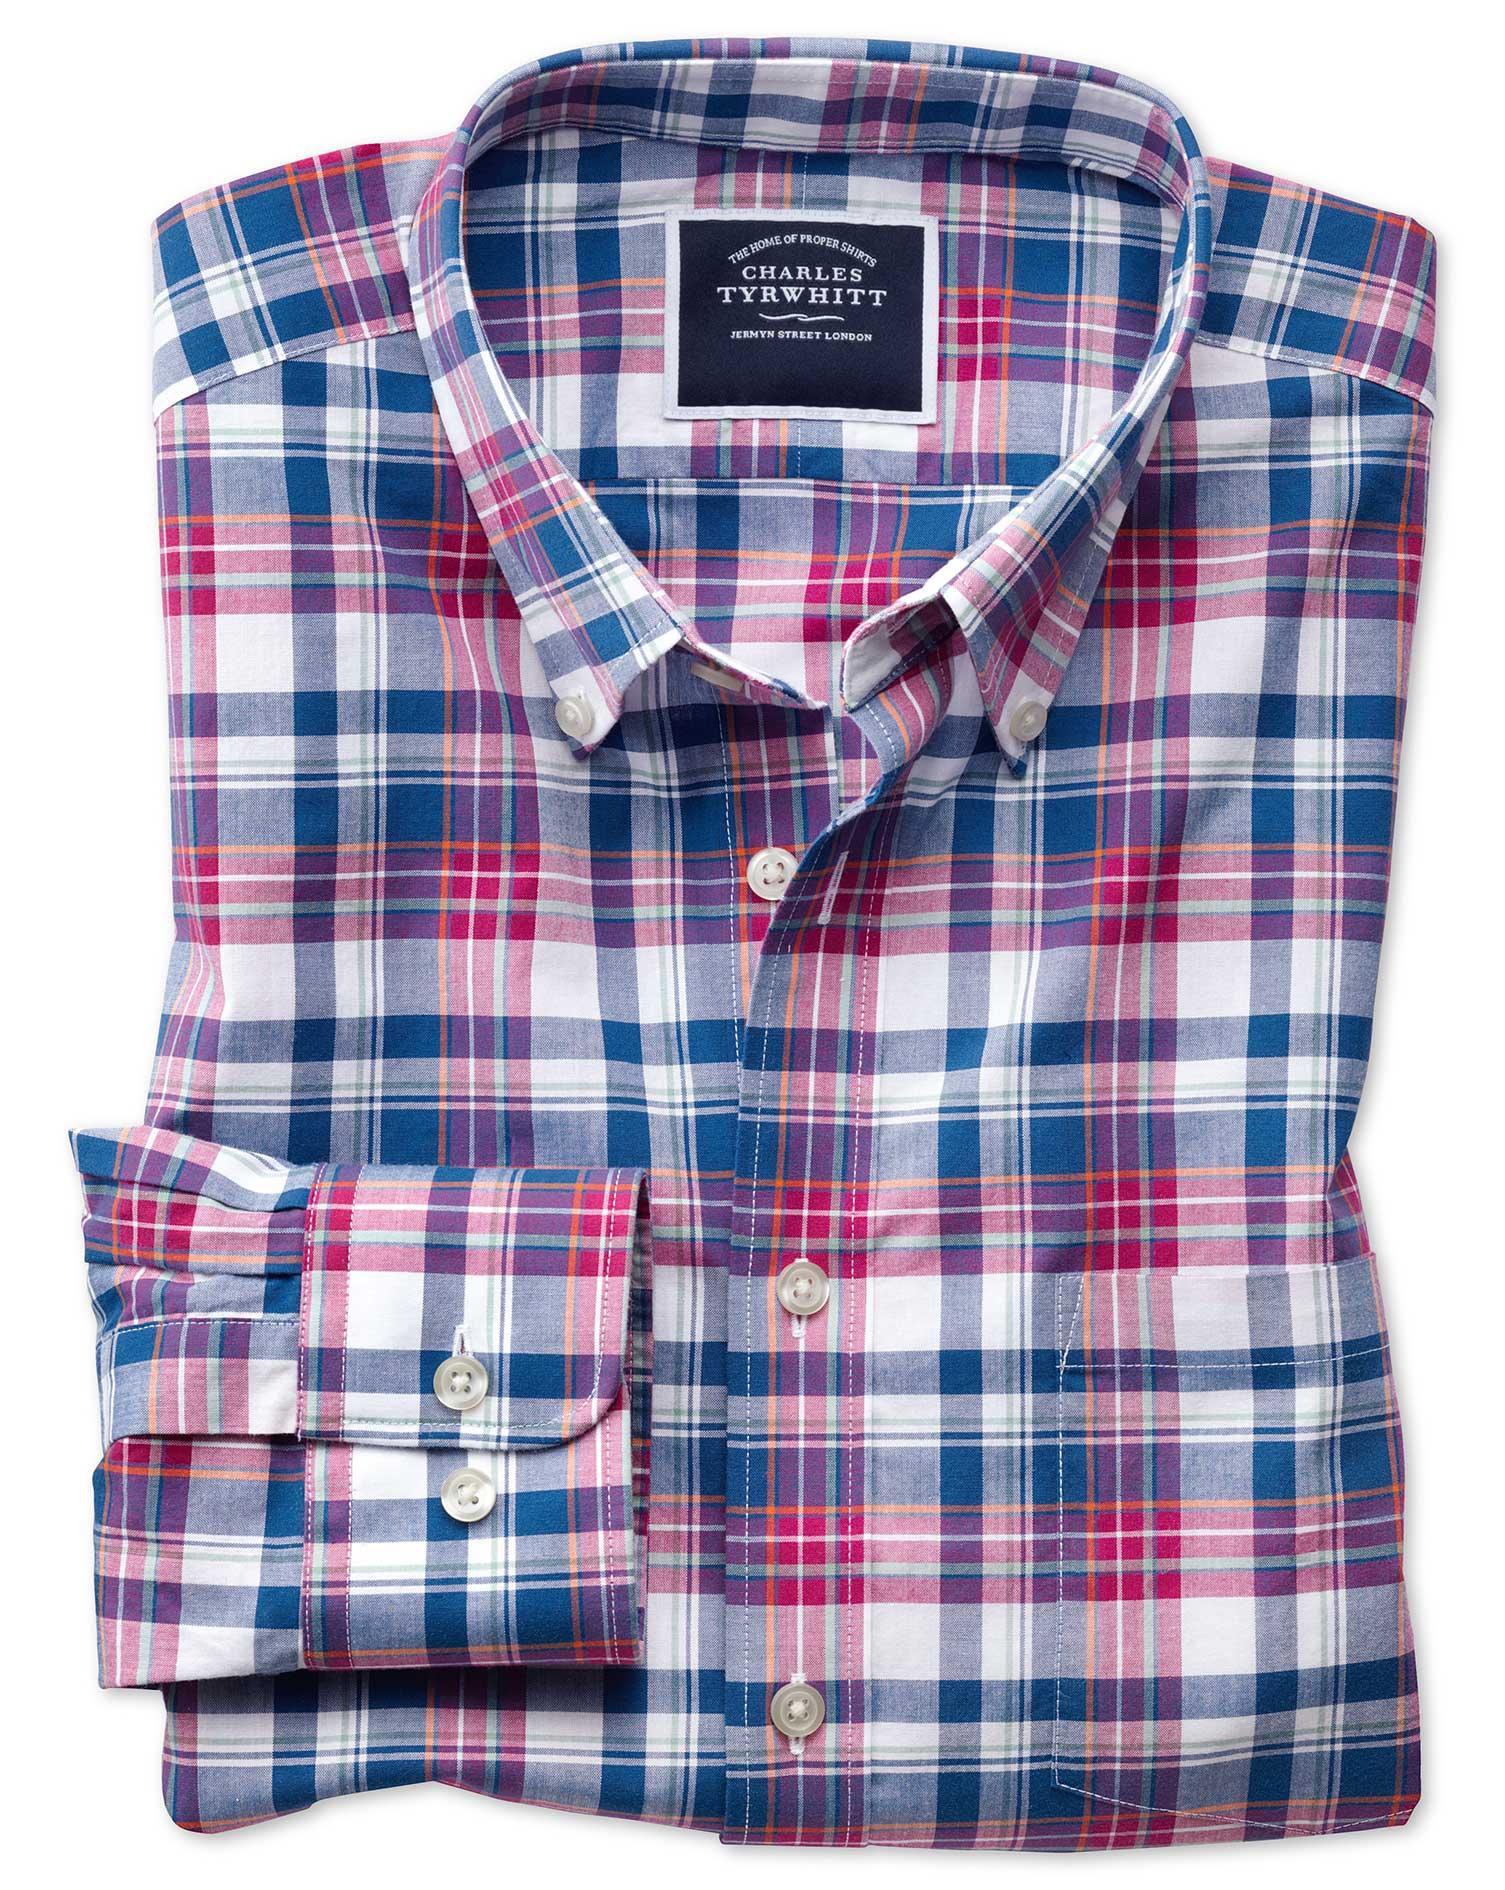 Classic Fit Poplin Pink and Navy Cotton Shirt Single Cuff Size XXXL by Charles Tyrwhitt